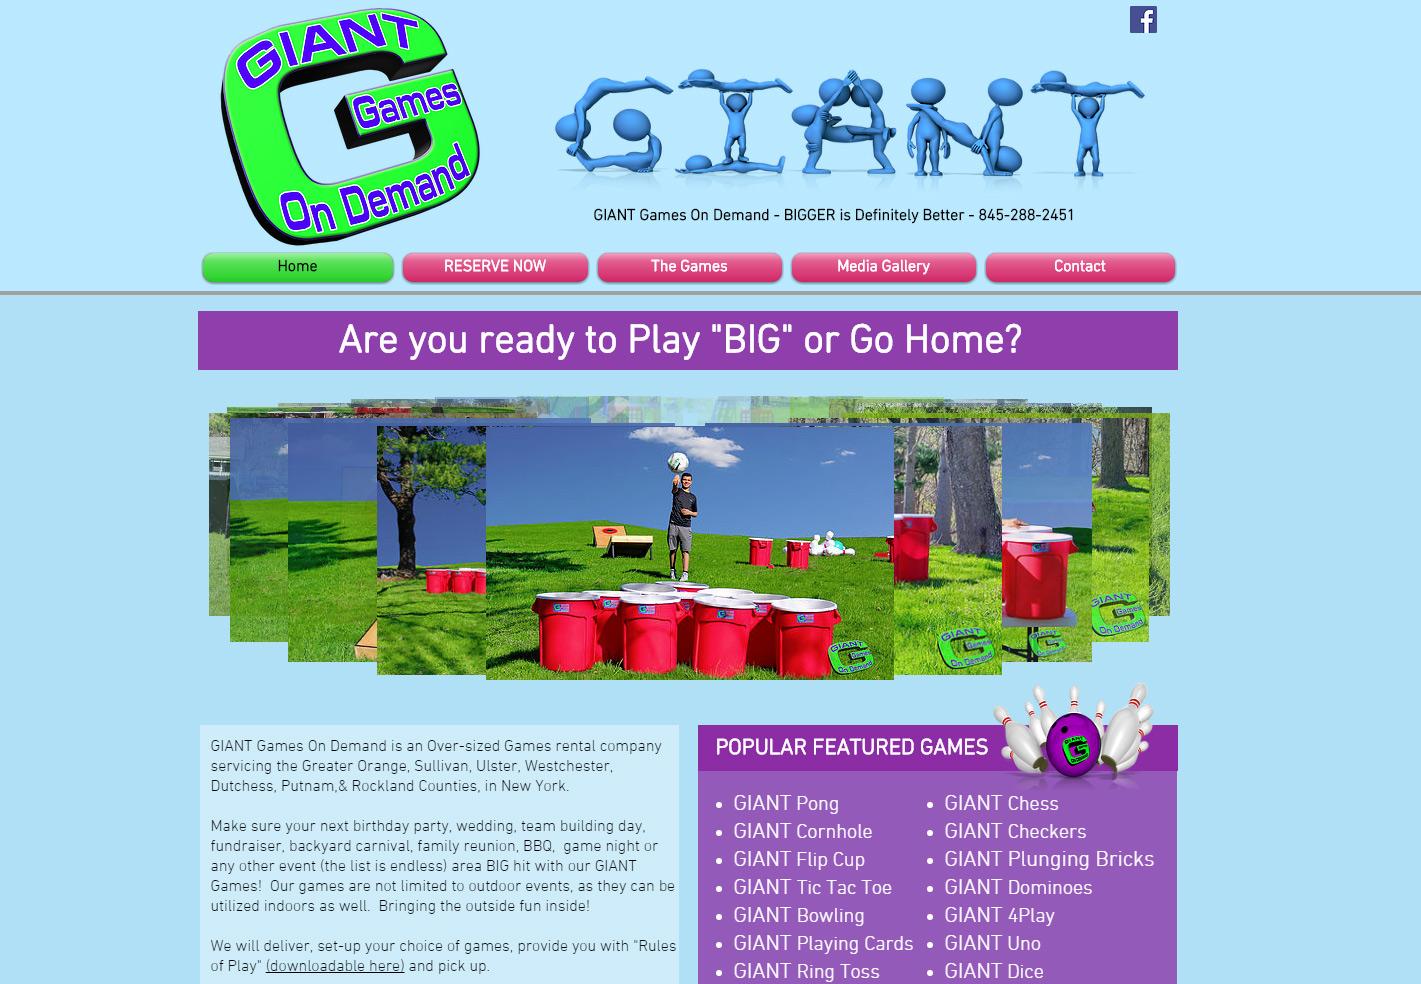 wwwgiantgamesondemandcom